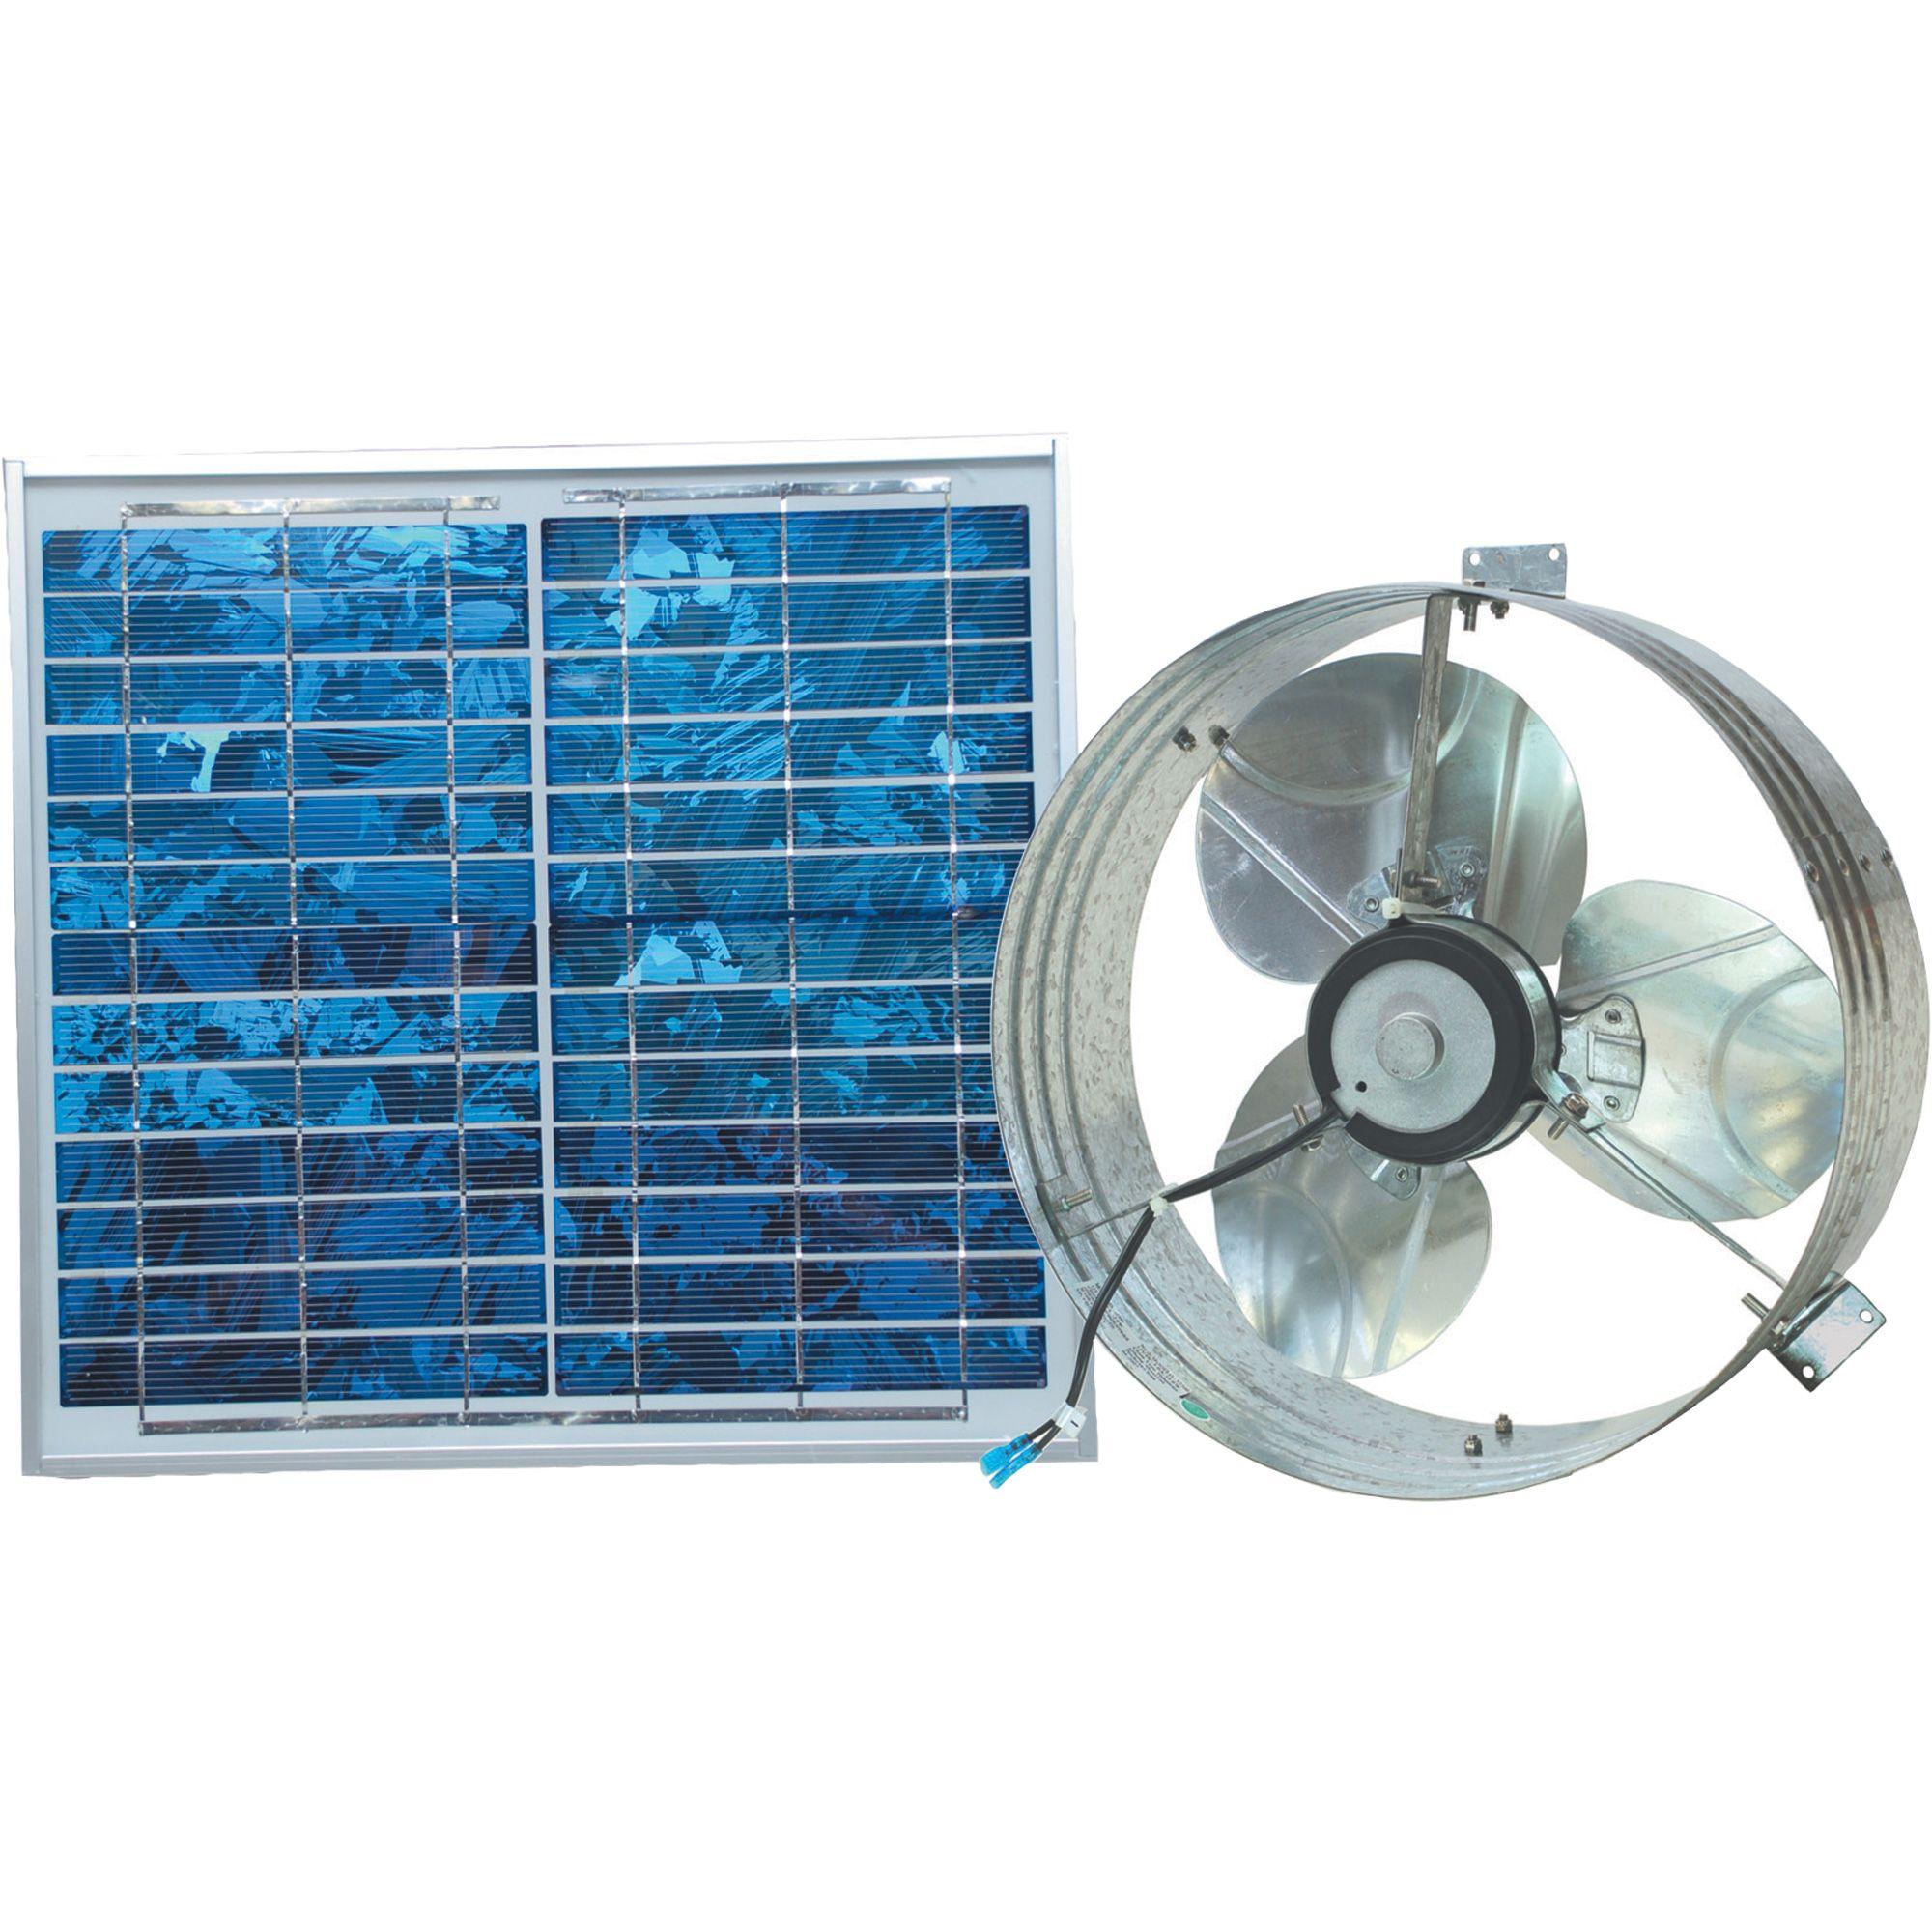 Ventamatic Solar Powered Ventilating Fan With Panel Gable Mounted Ventilator 1 000 Cfm Model Vx2515solargabl Solar Fan Solar Attic Fan Solar Power